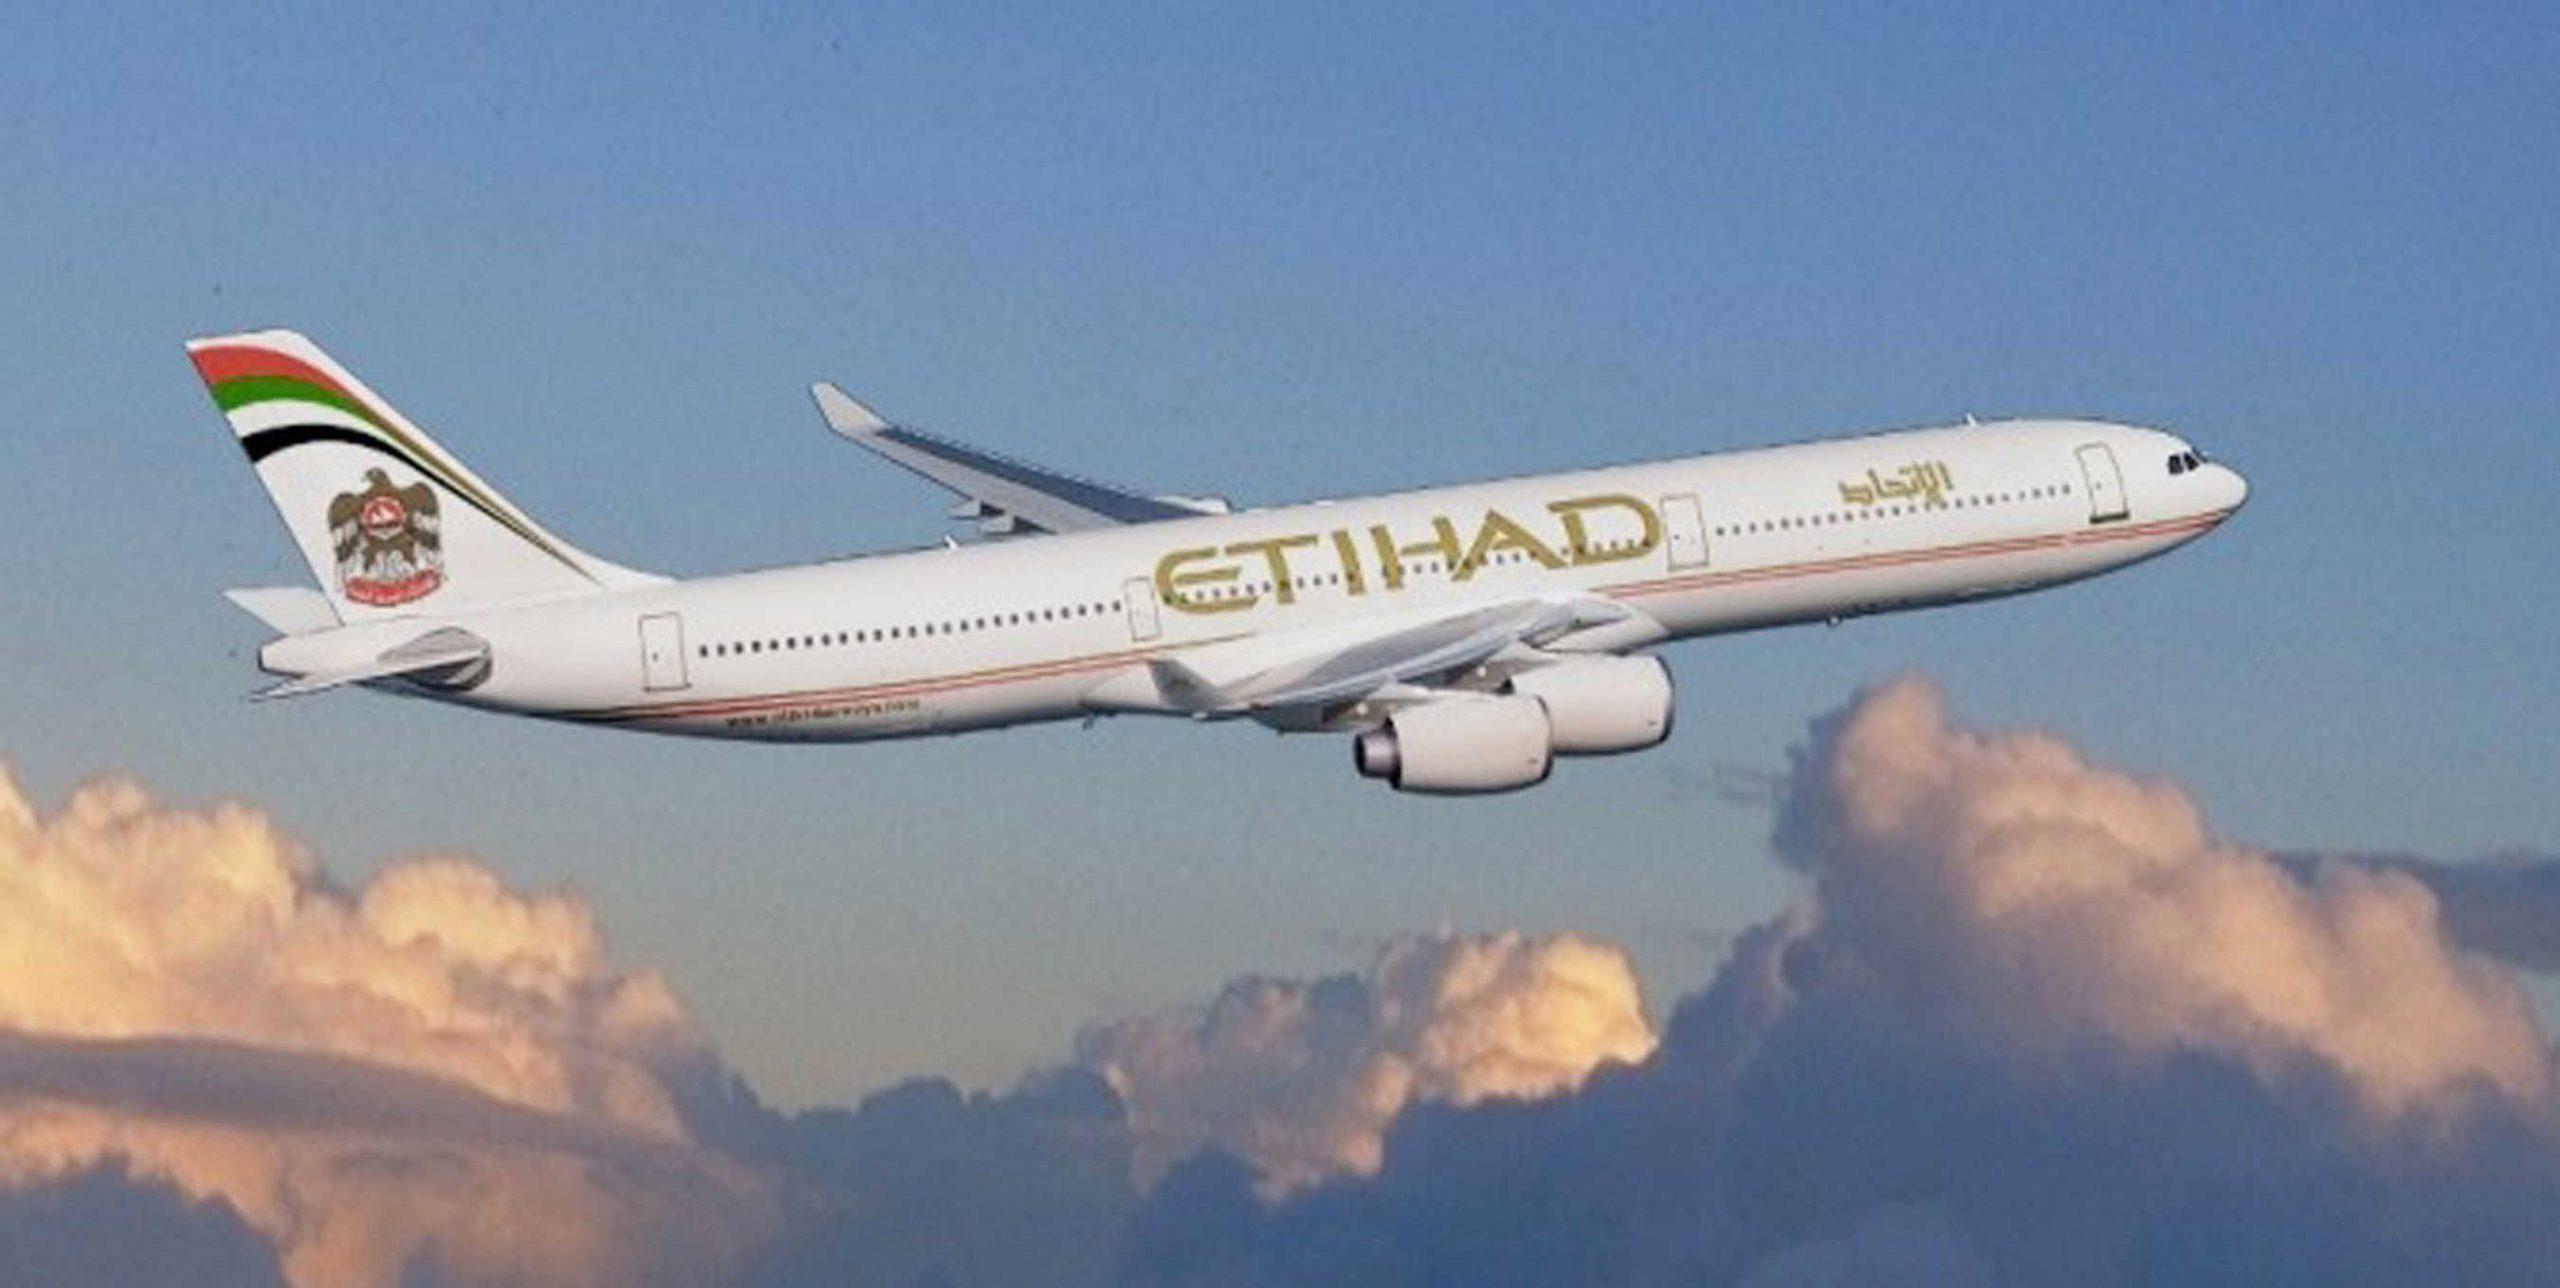 Etihad A340-500 Aircraft. (PRNewsFoto/Etihad Airways)